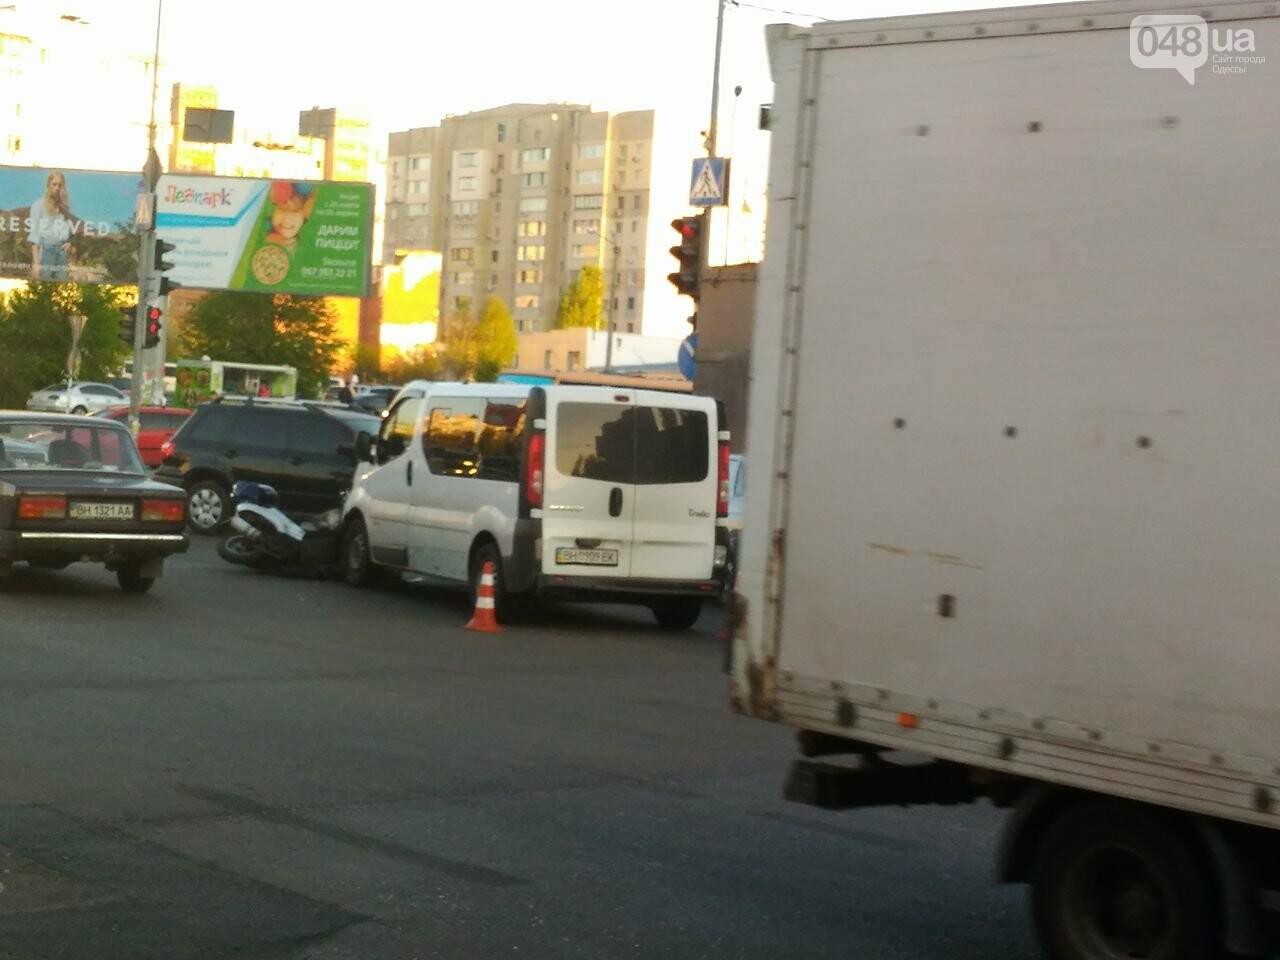 На Котовского одесский мопедист попал под колеса микроавтобуса (ФОТО), фото-2